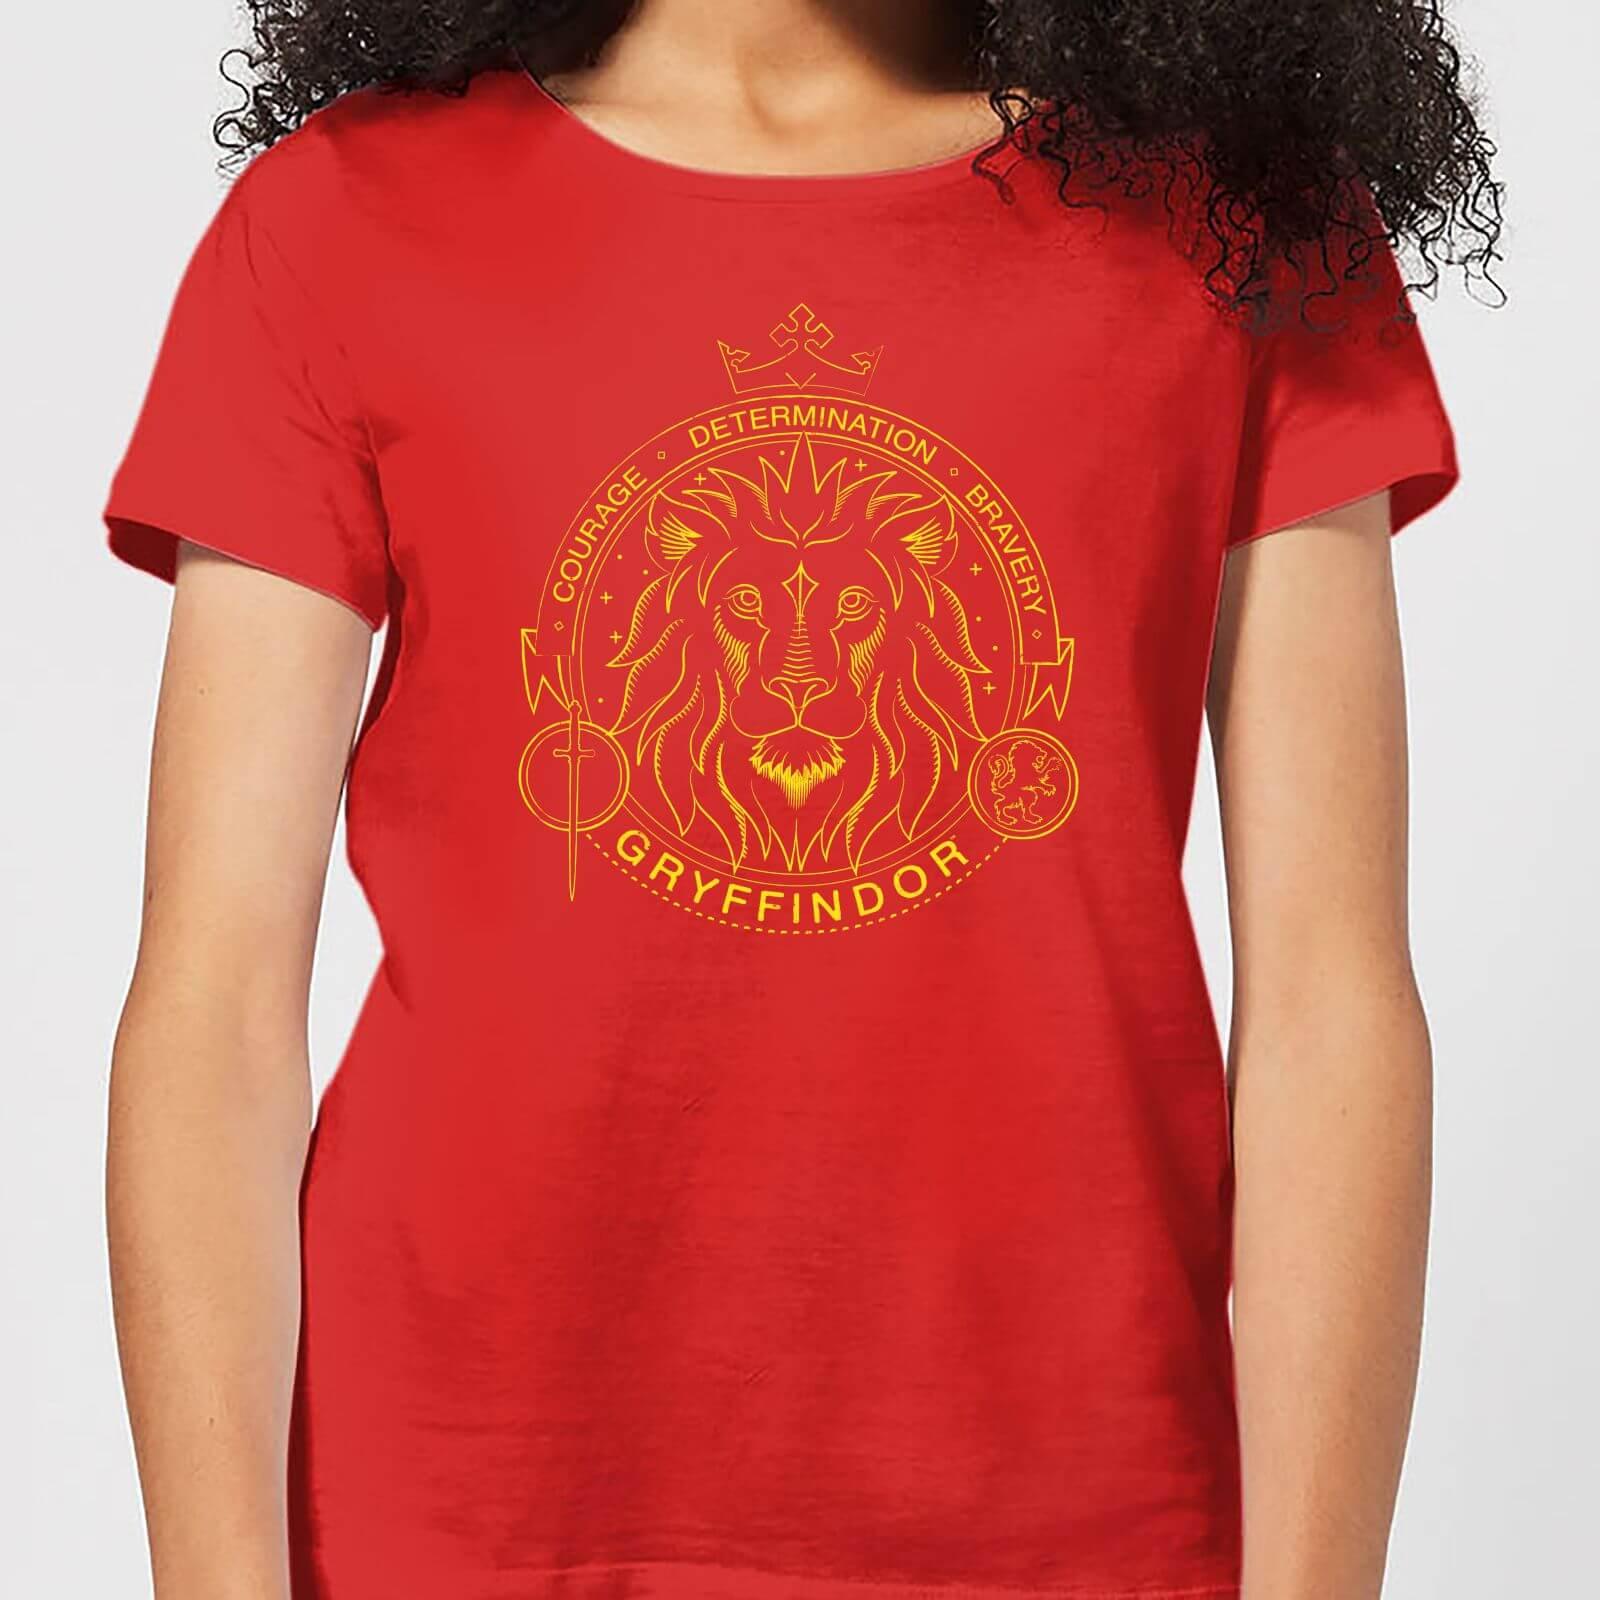 Harry Potter Gryffindor Lion Badge Women's T-Shirt - Red - M - Rouge